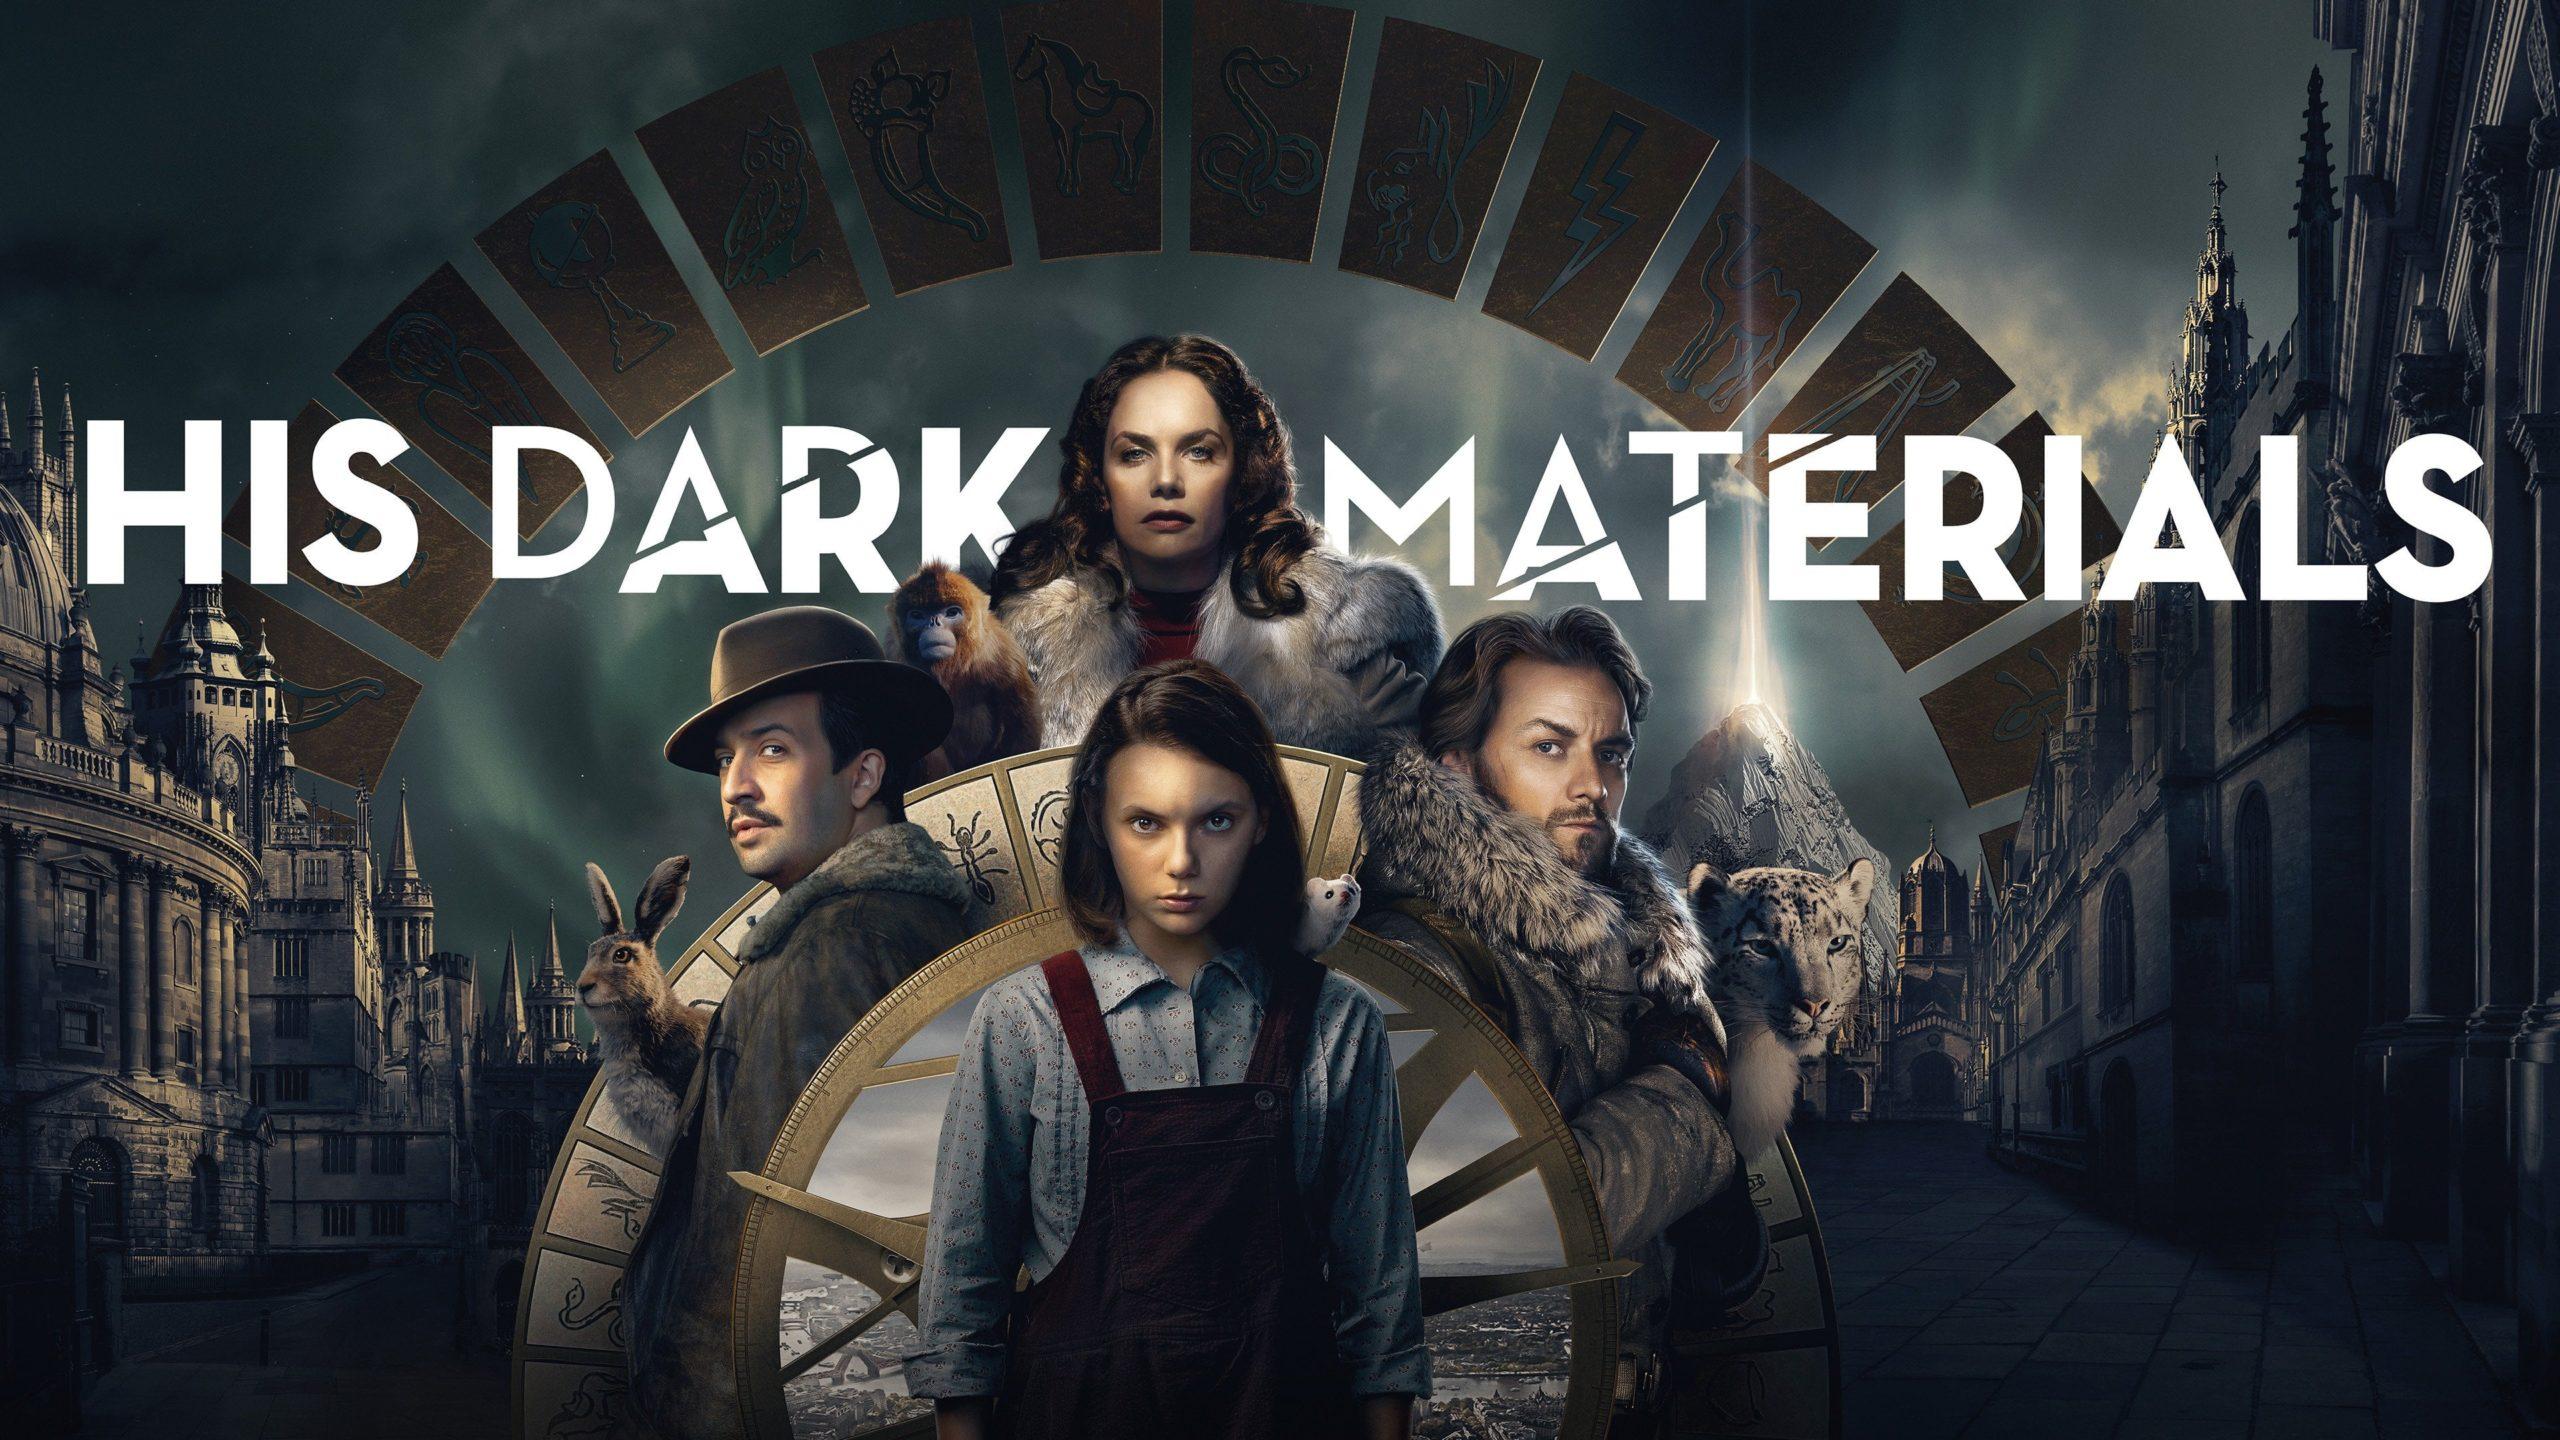 His Dark Materials Season 2 Episode 6